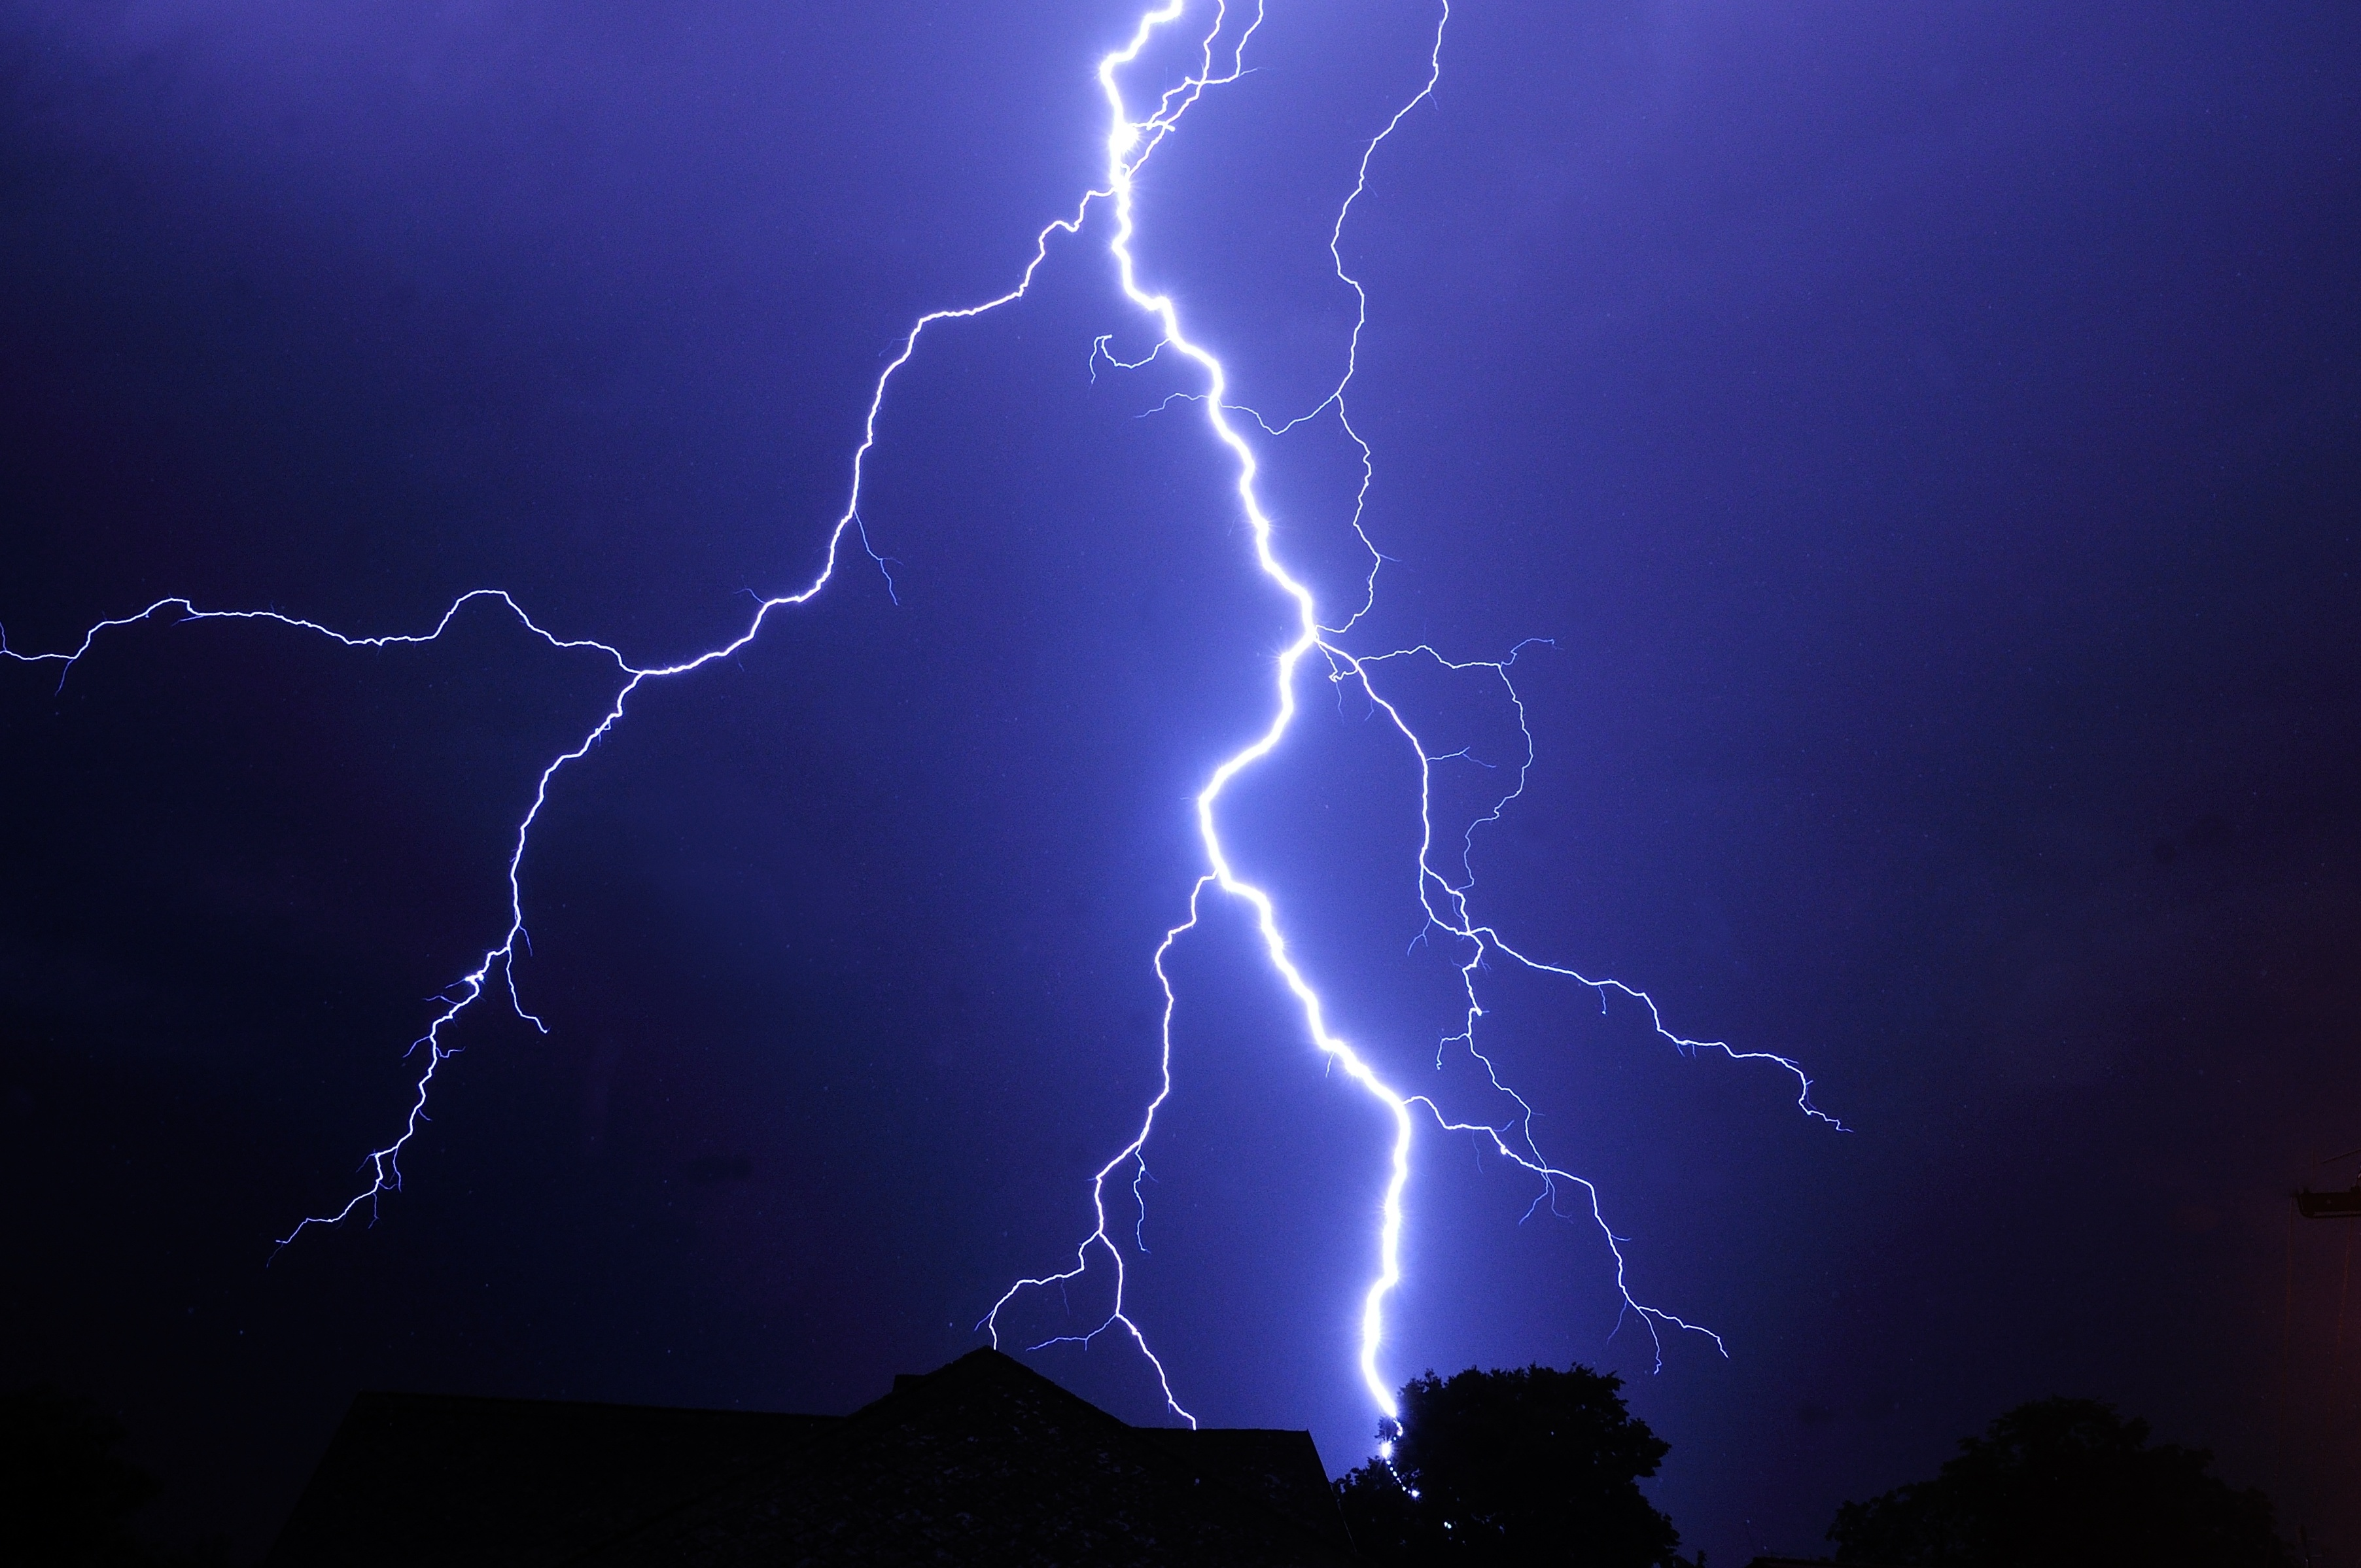 Severe thunderstorm warning issued